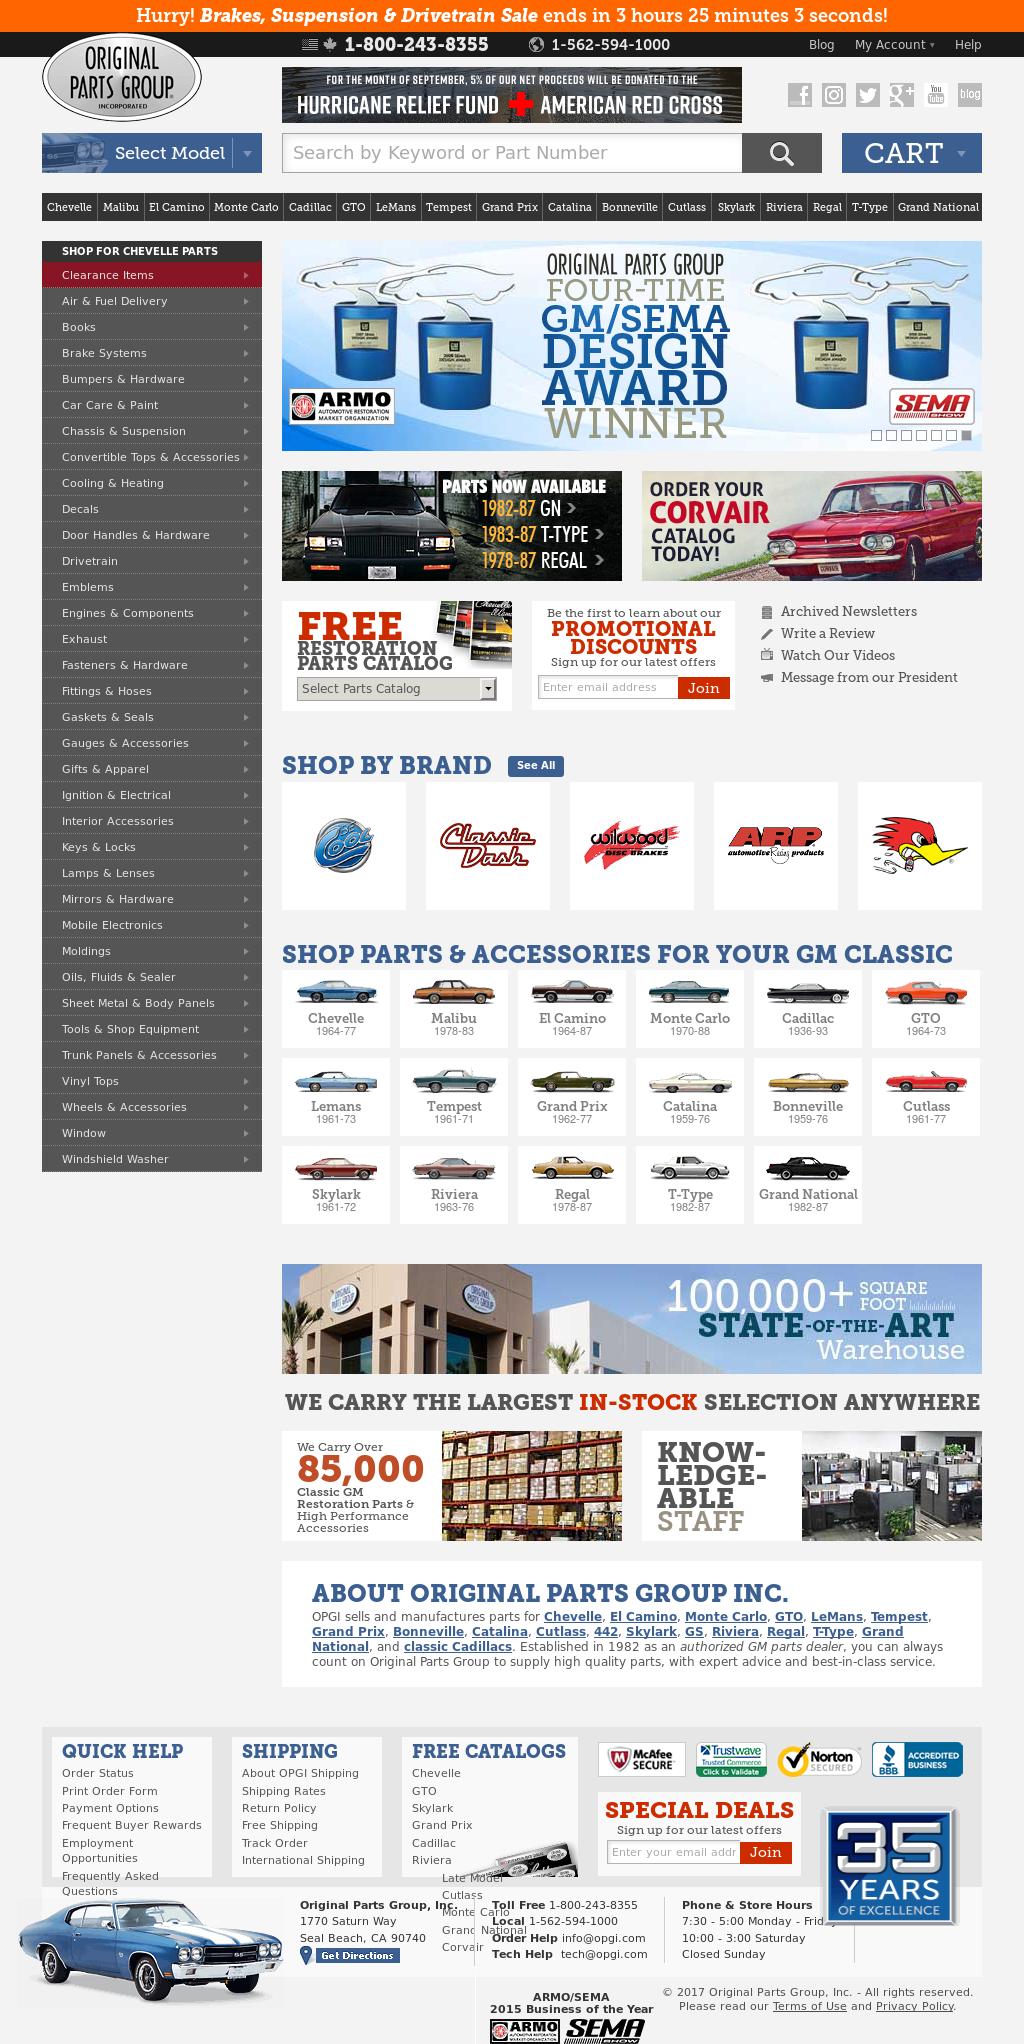 OPGI Competitors, Revenue and Employees - Owler Company Profile